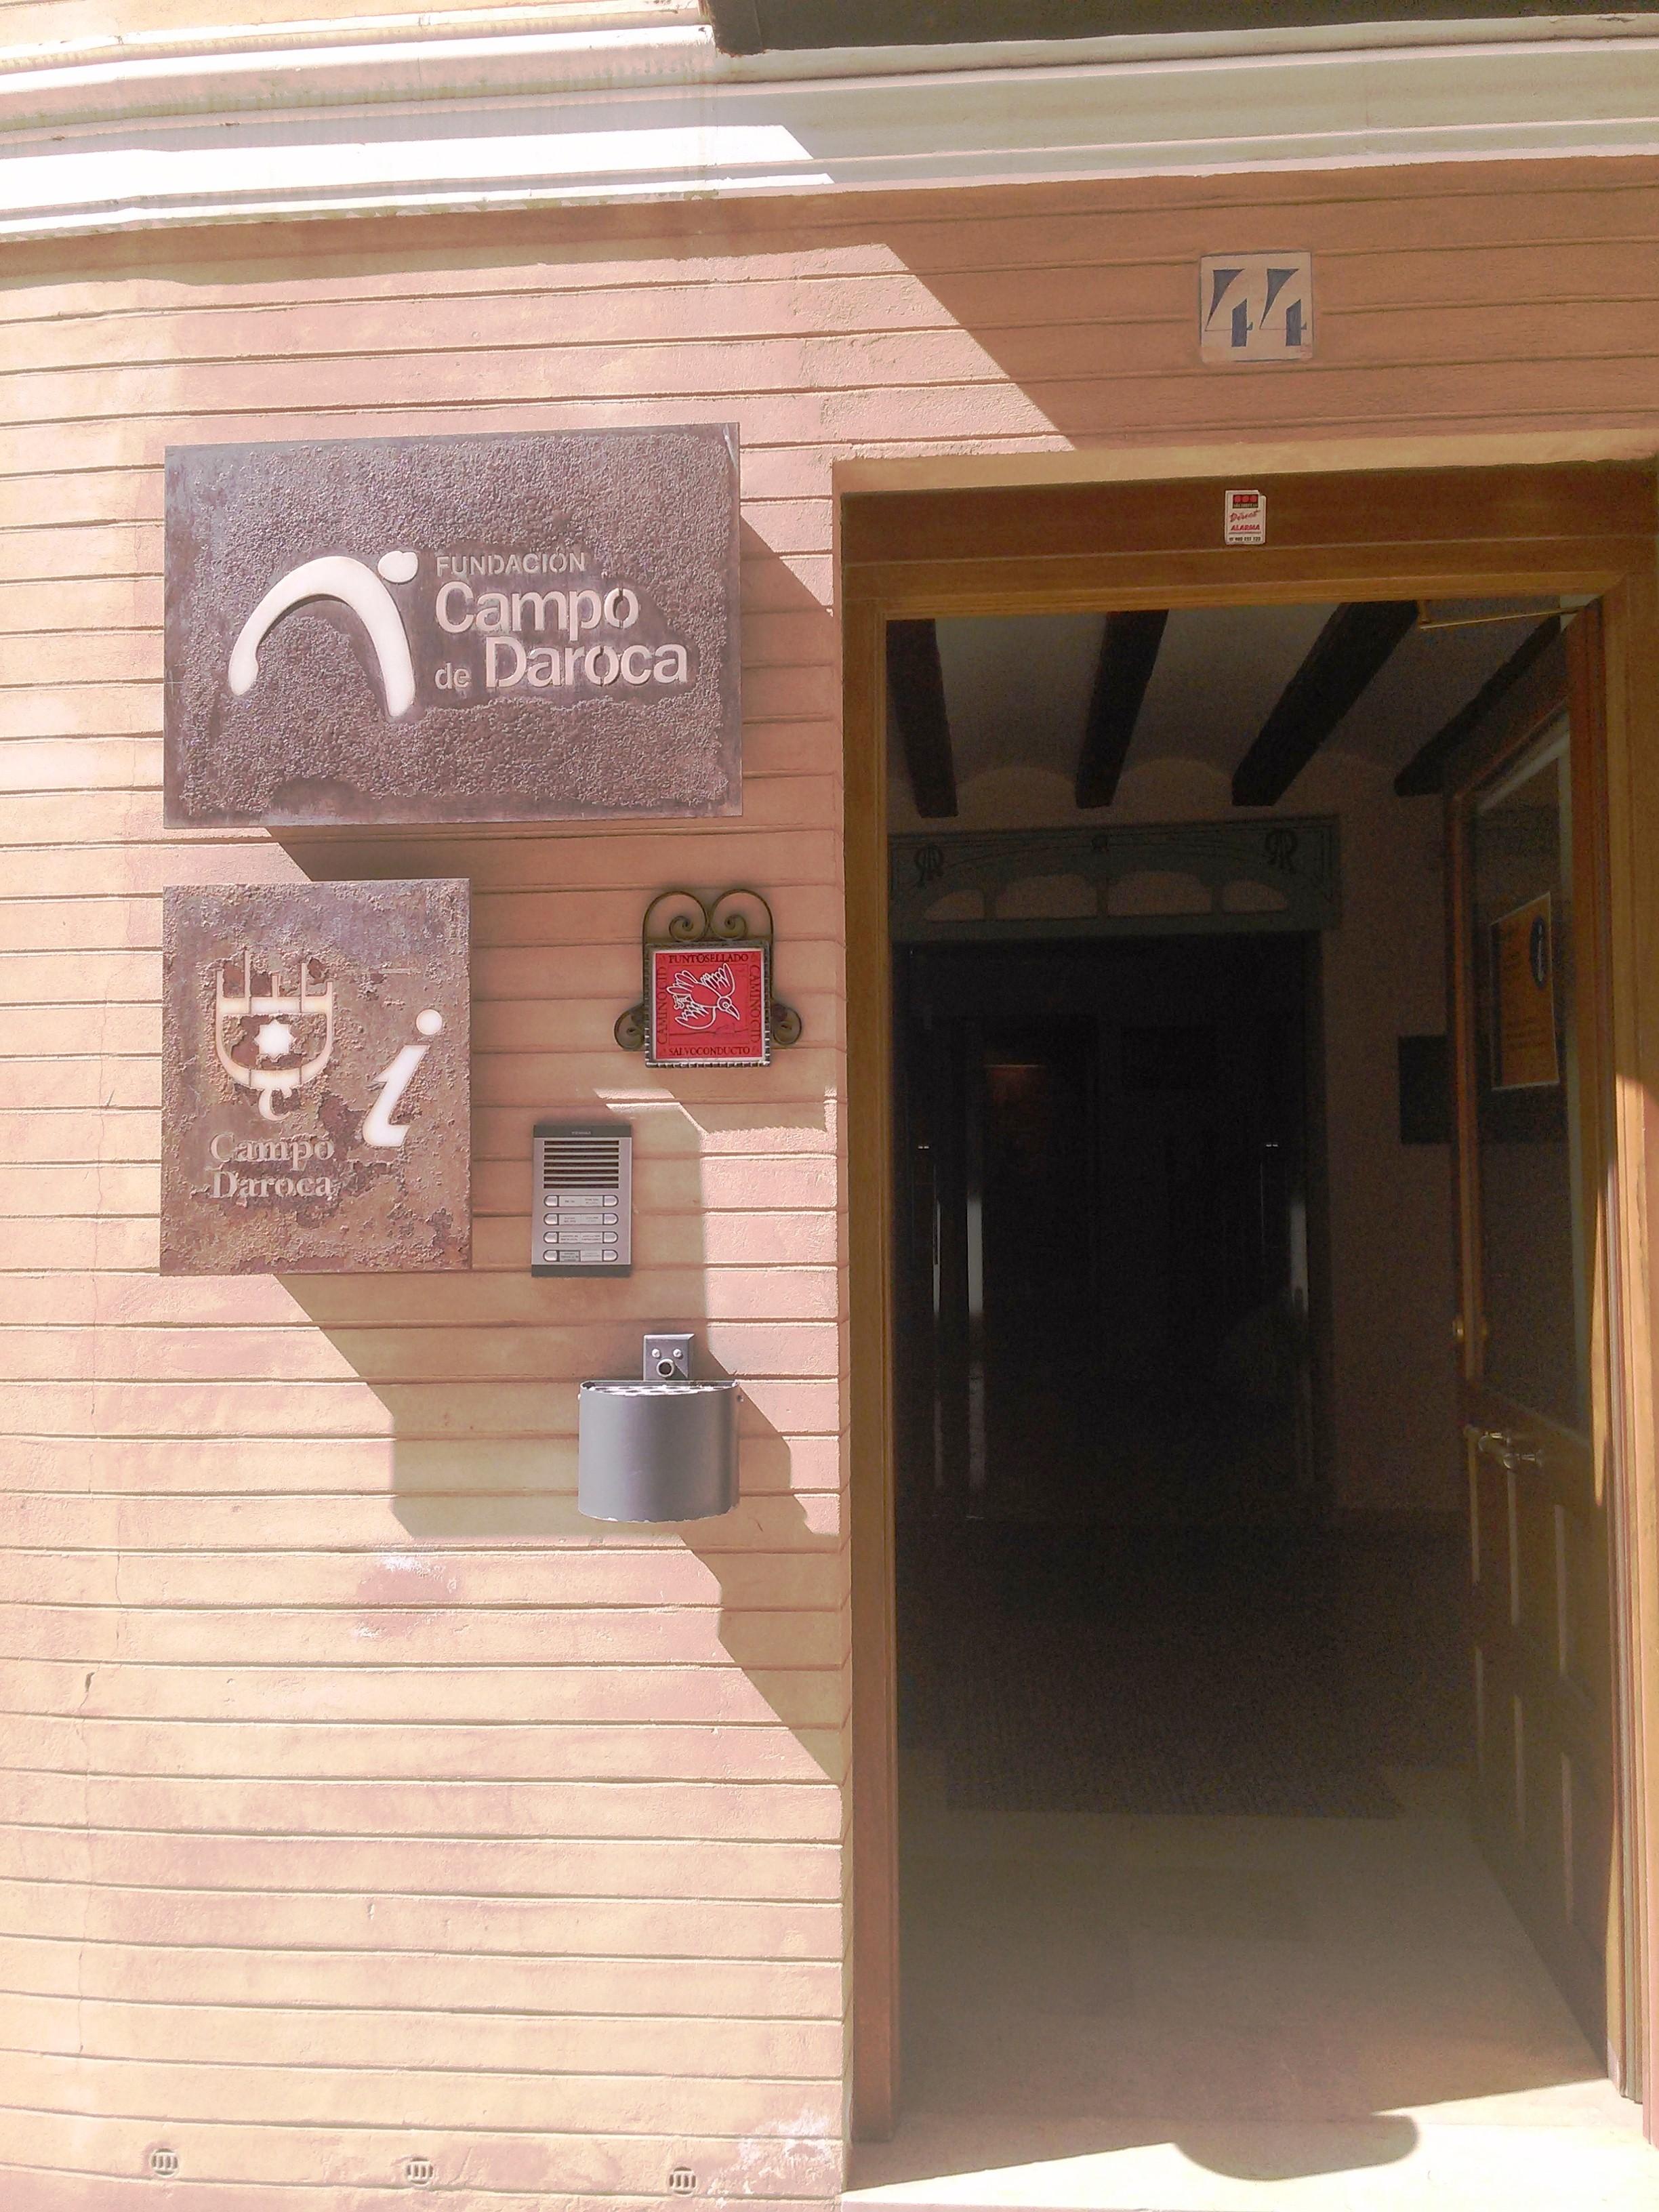 Oficina de Turismo Puerta